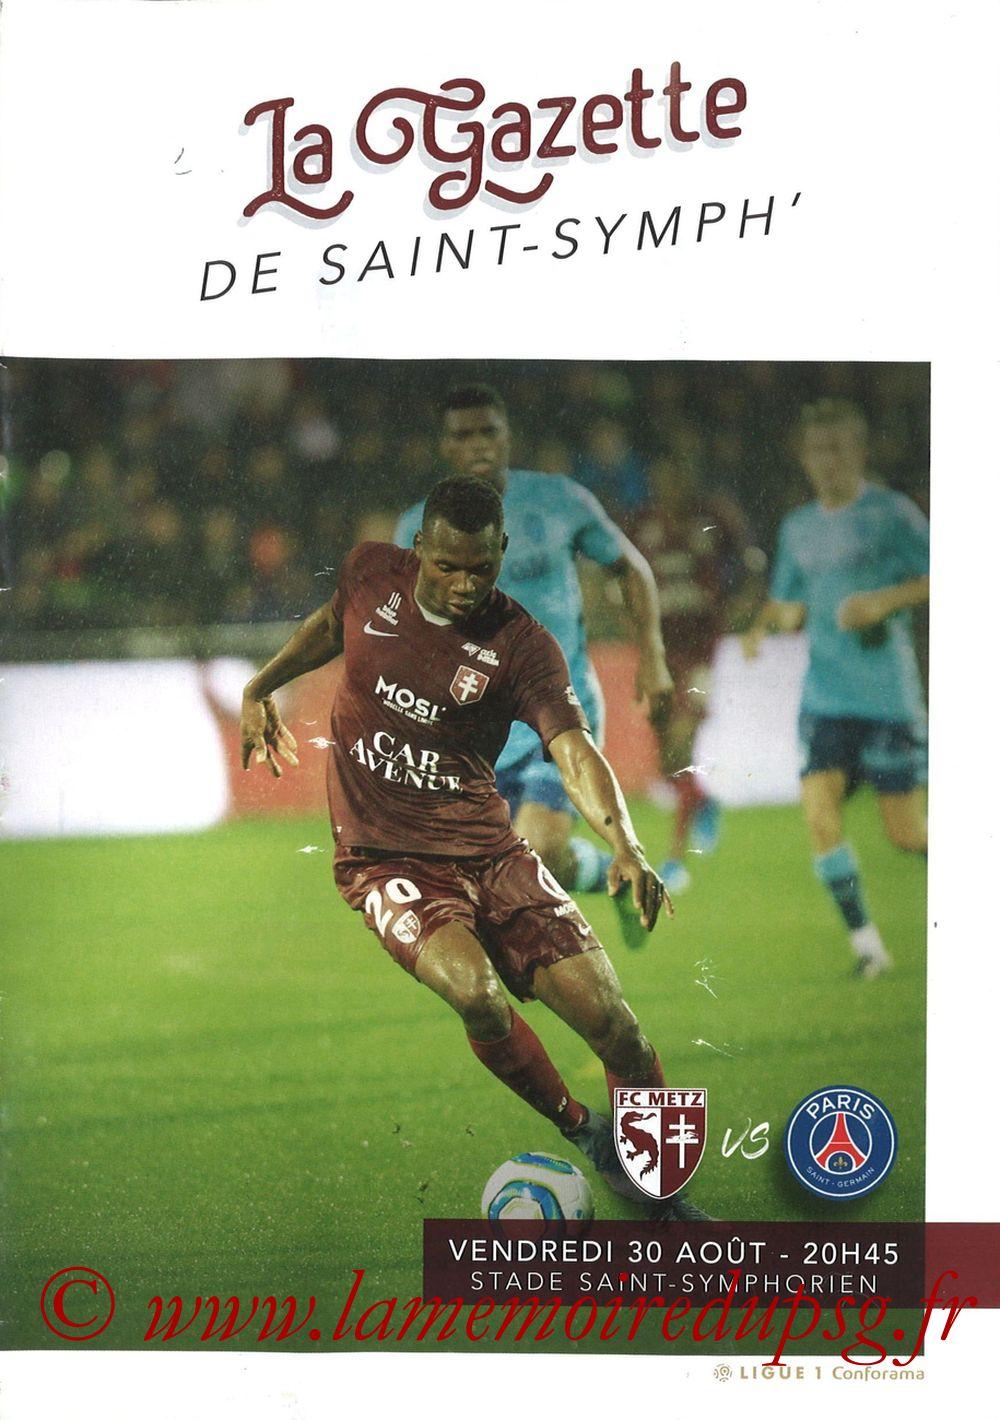 2019-08-30  Metz-PSG (4ème L1, La Gazette de Saint-Symph')